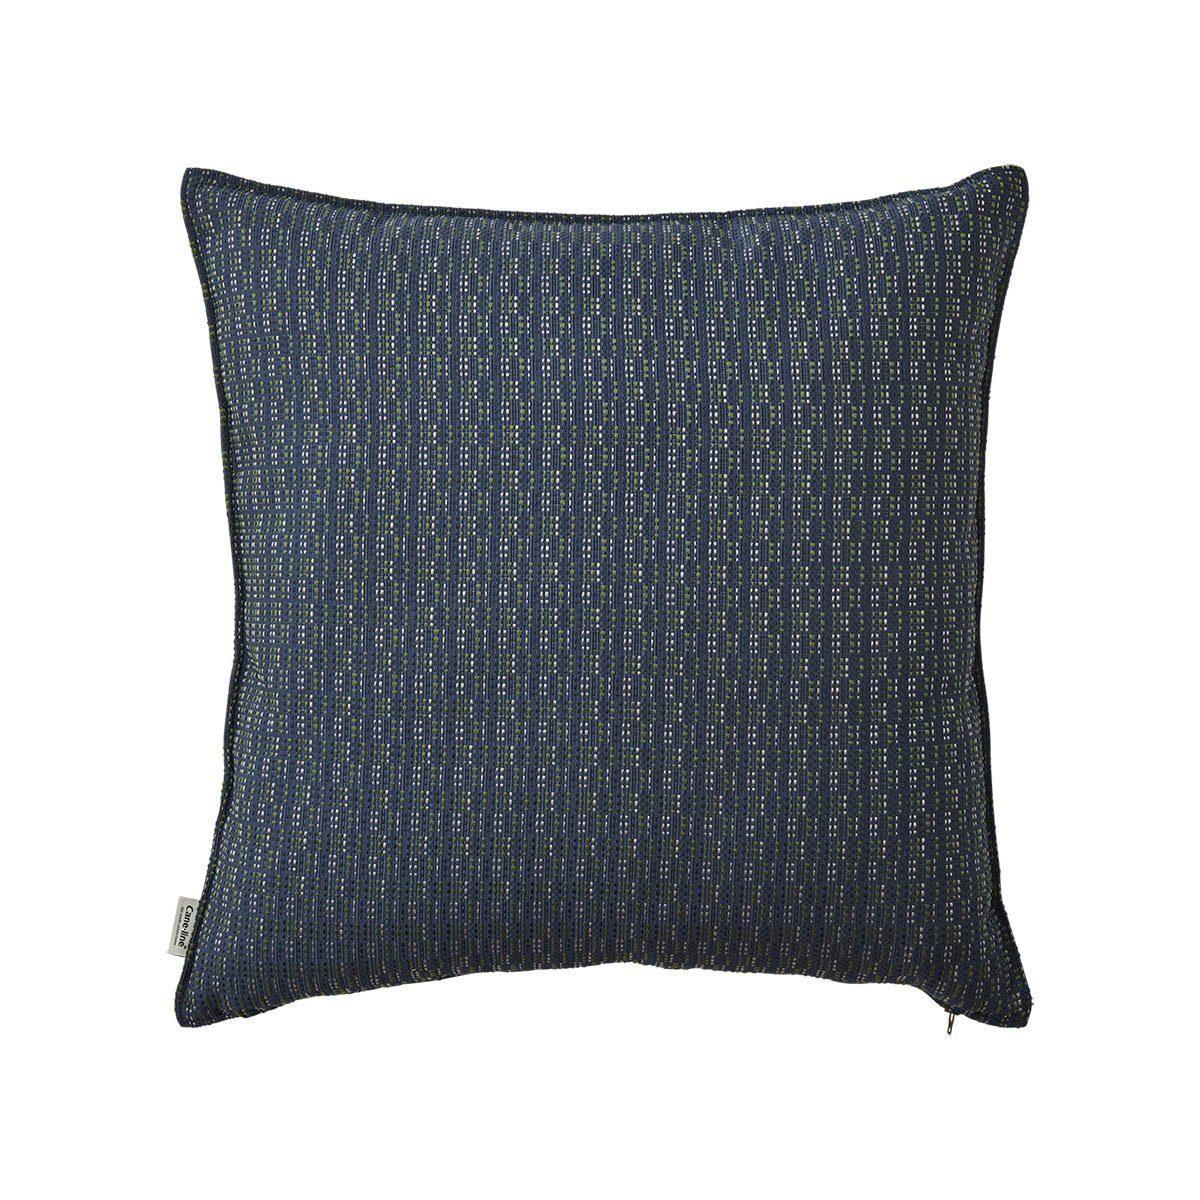 Stripe multi blue kuddfodral från Cane-line i storleken 50x50 cm.